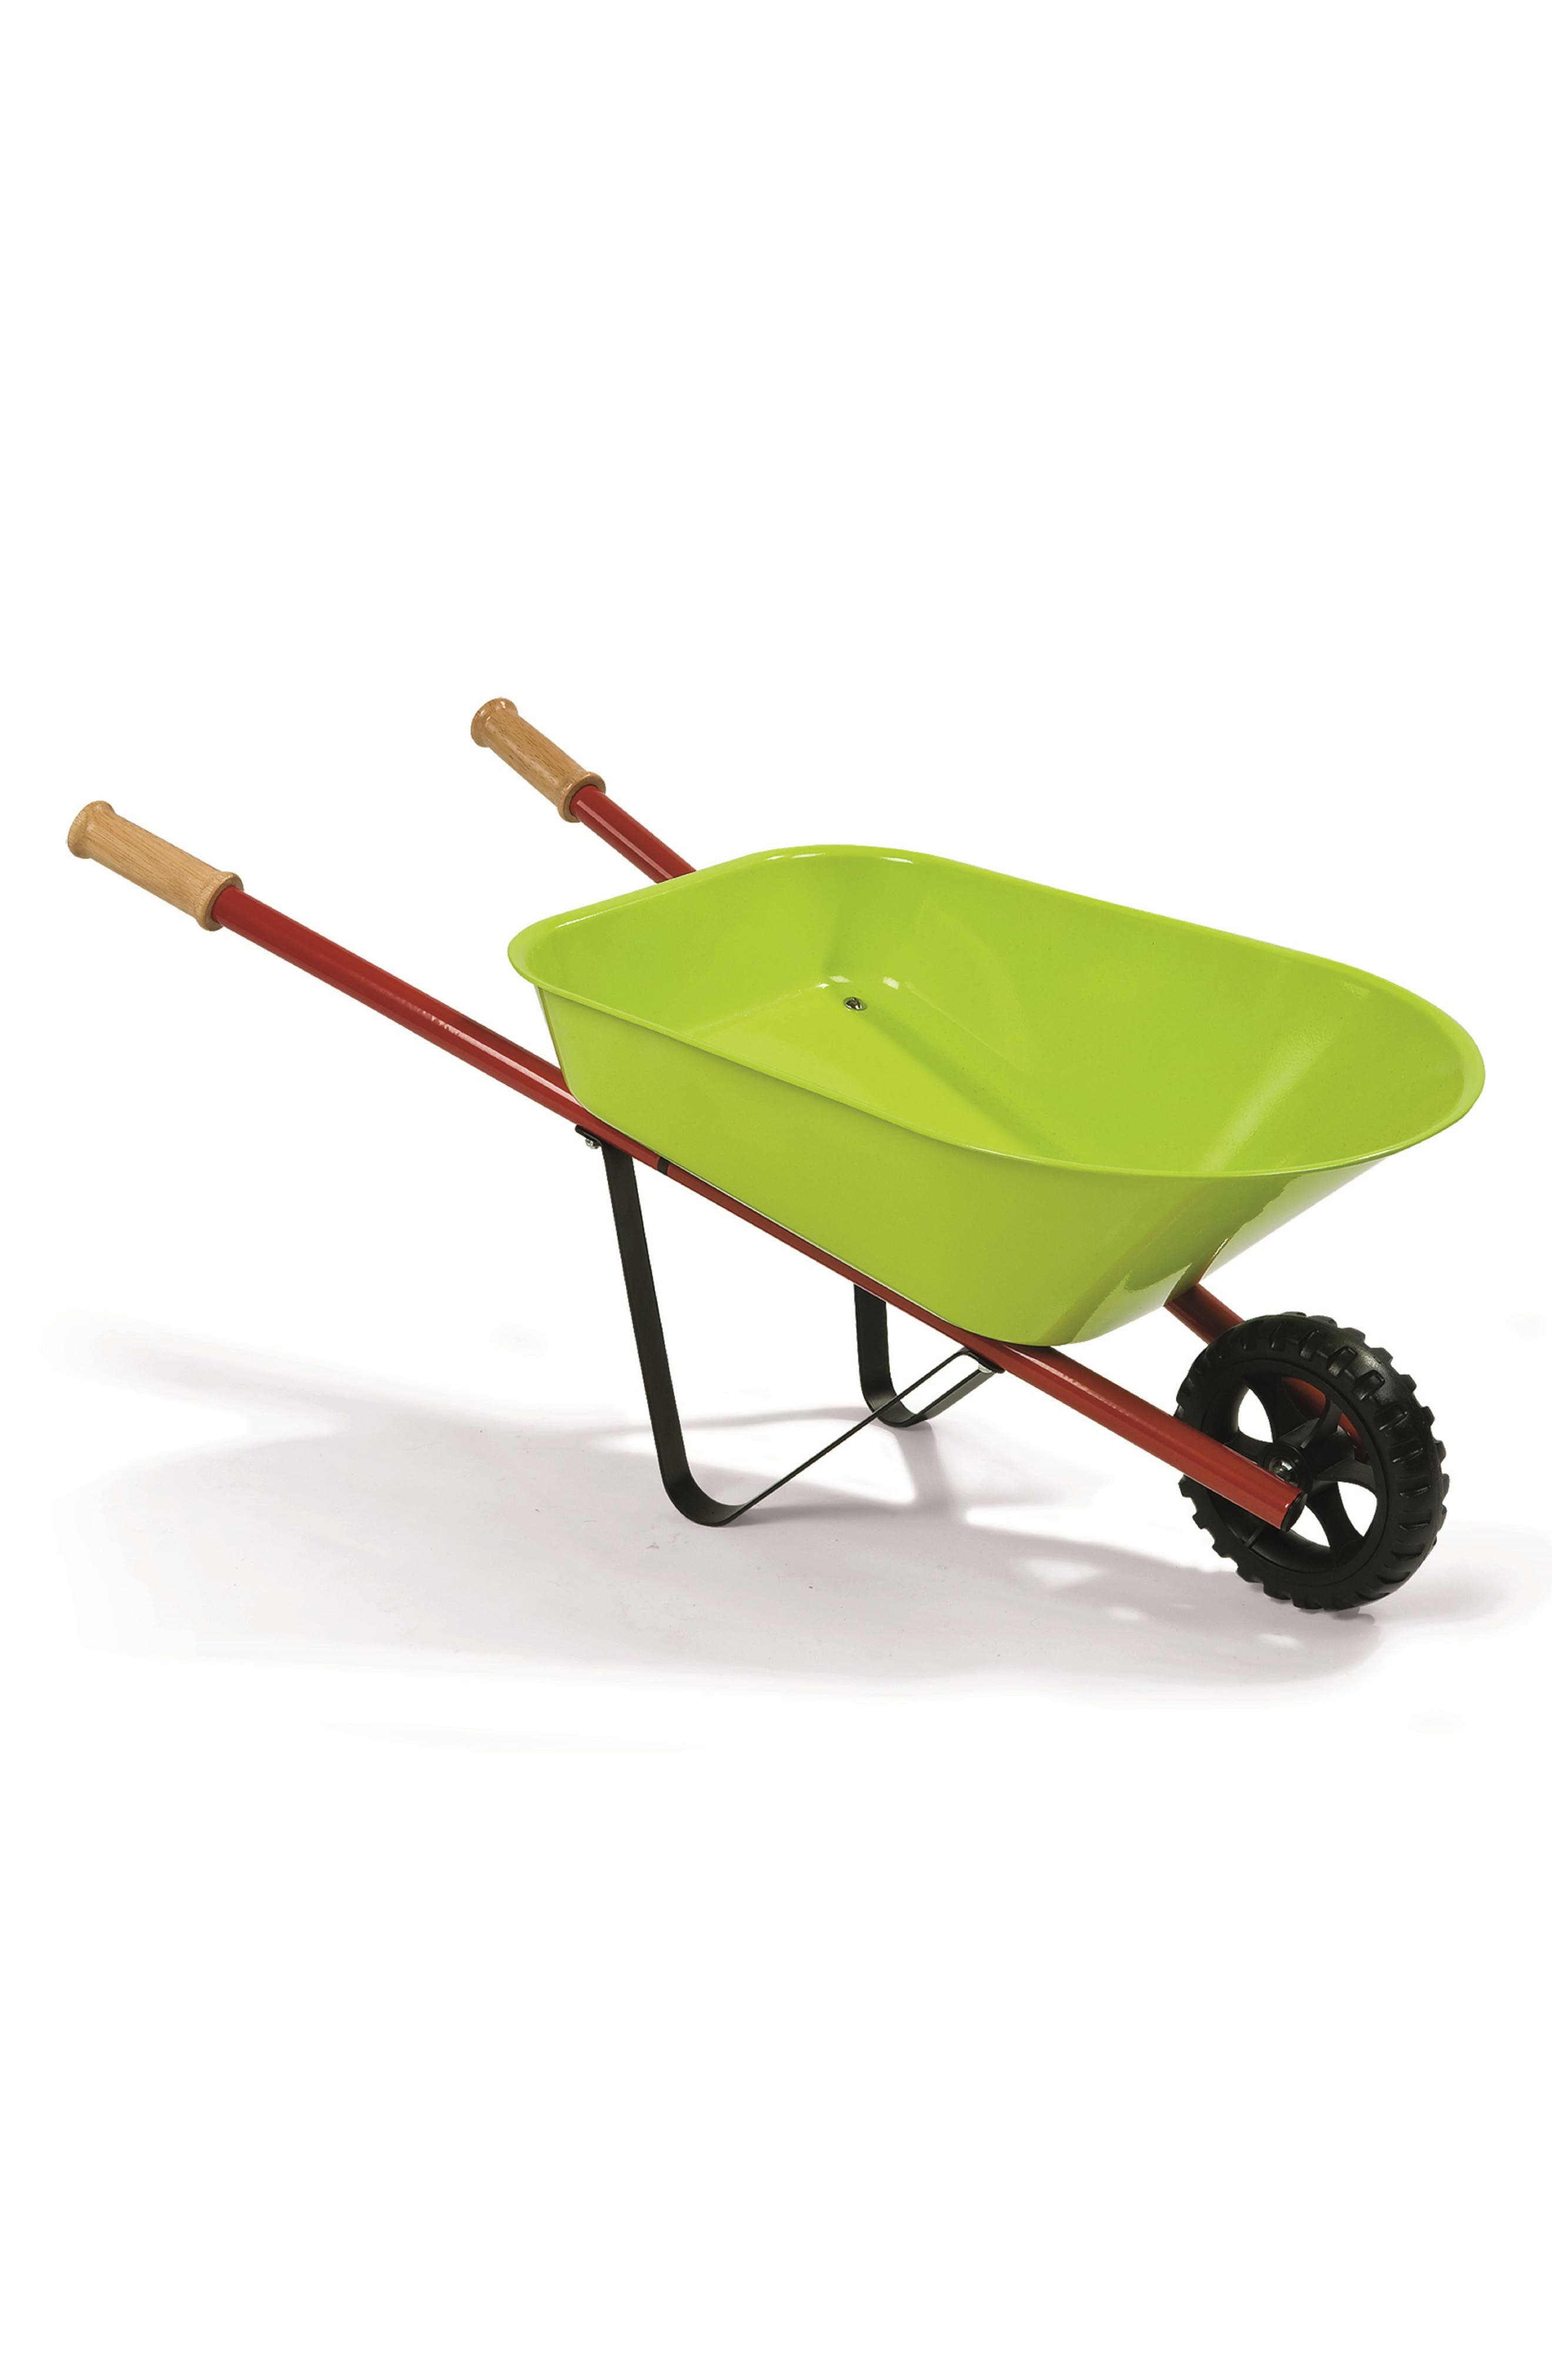 Main Image - Janod Metal Wheelbarrow Set